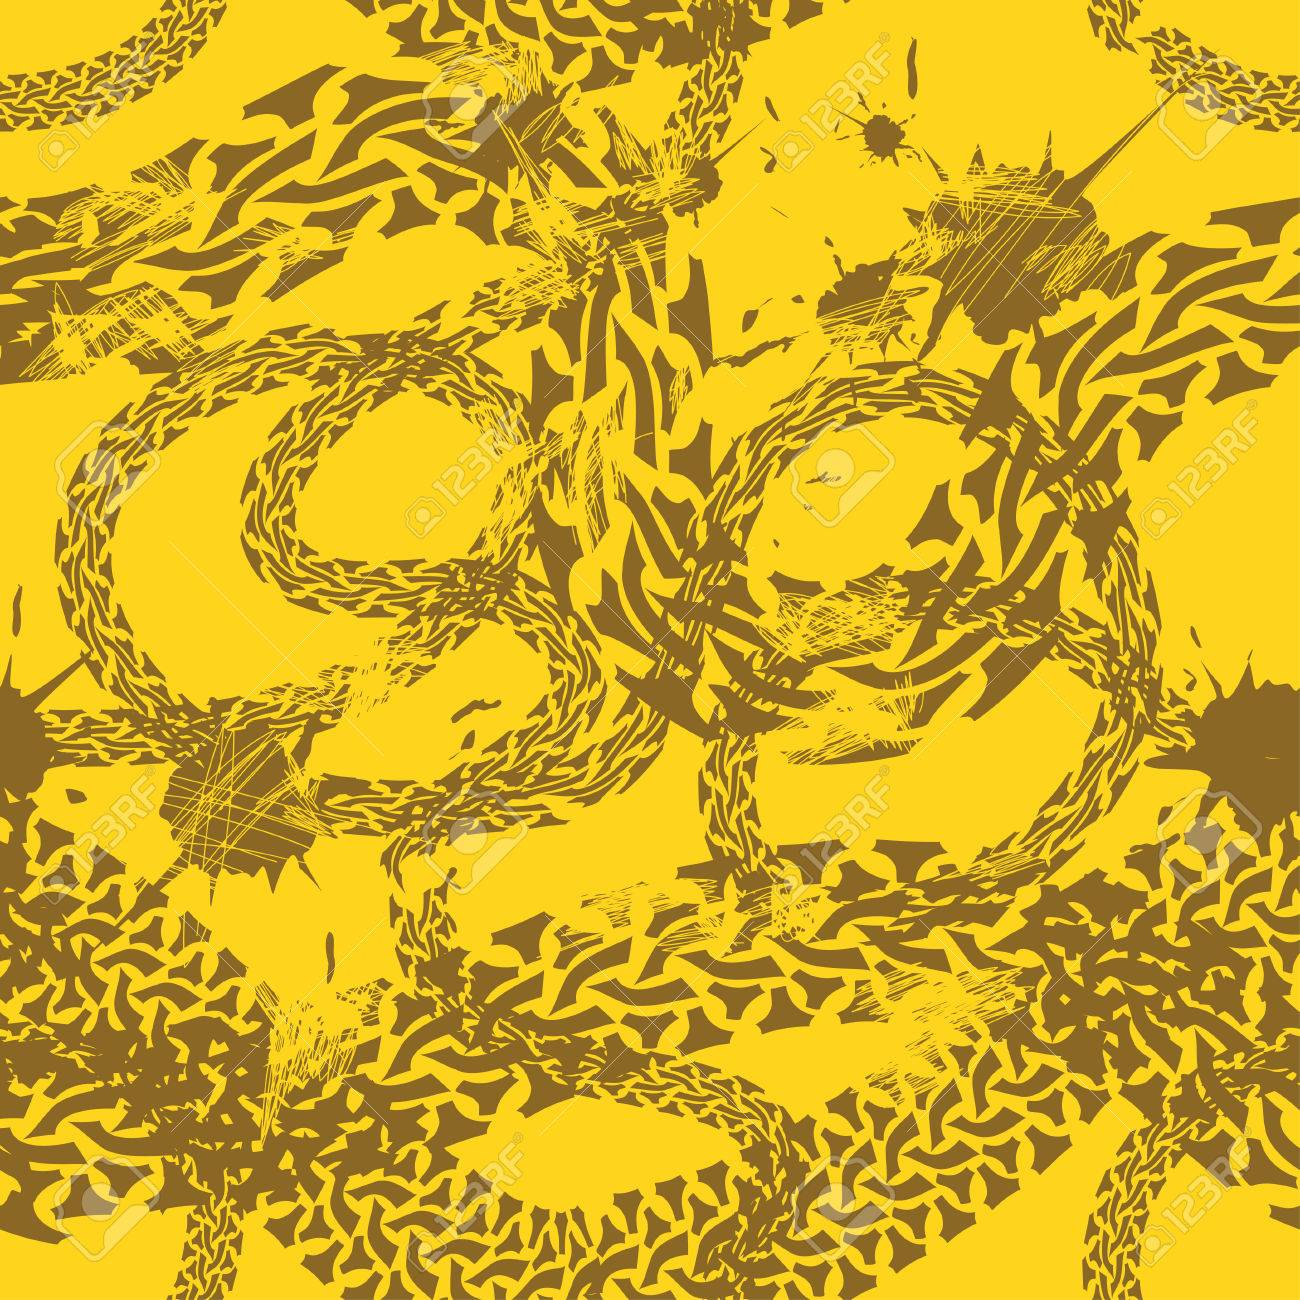 Grunge seamless pattern of tire tracks Stock Vector - 23498616